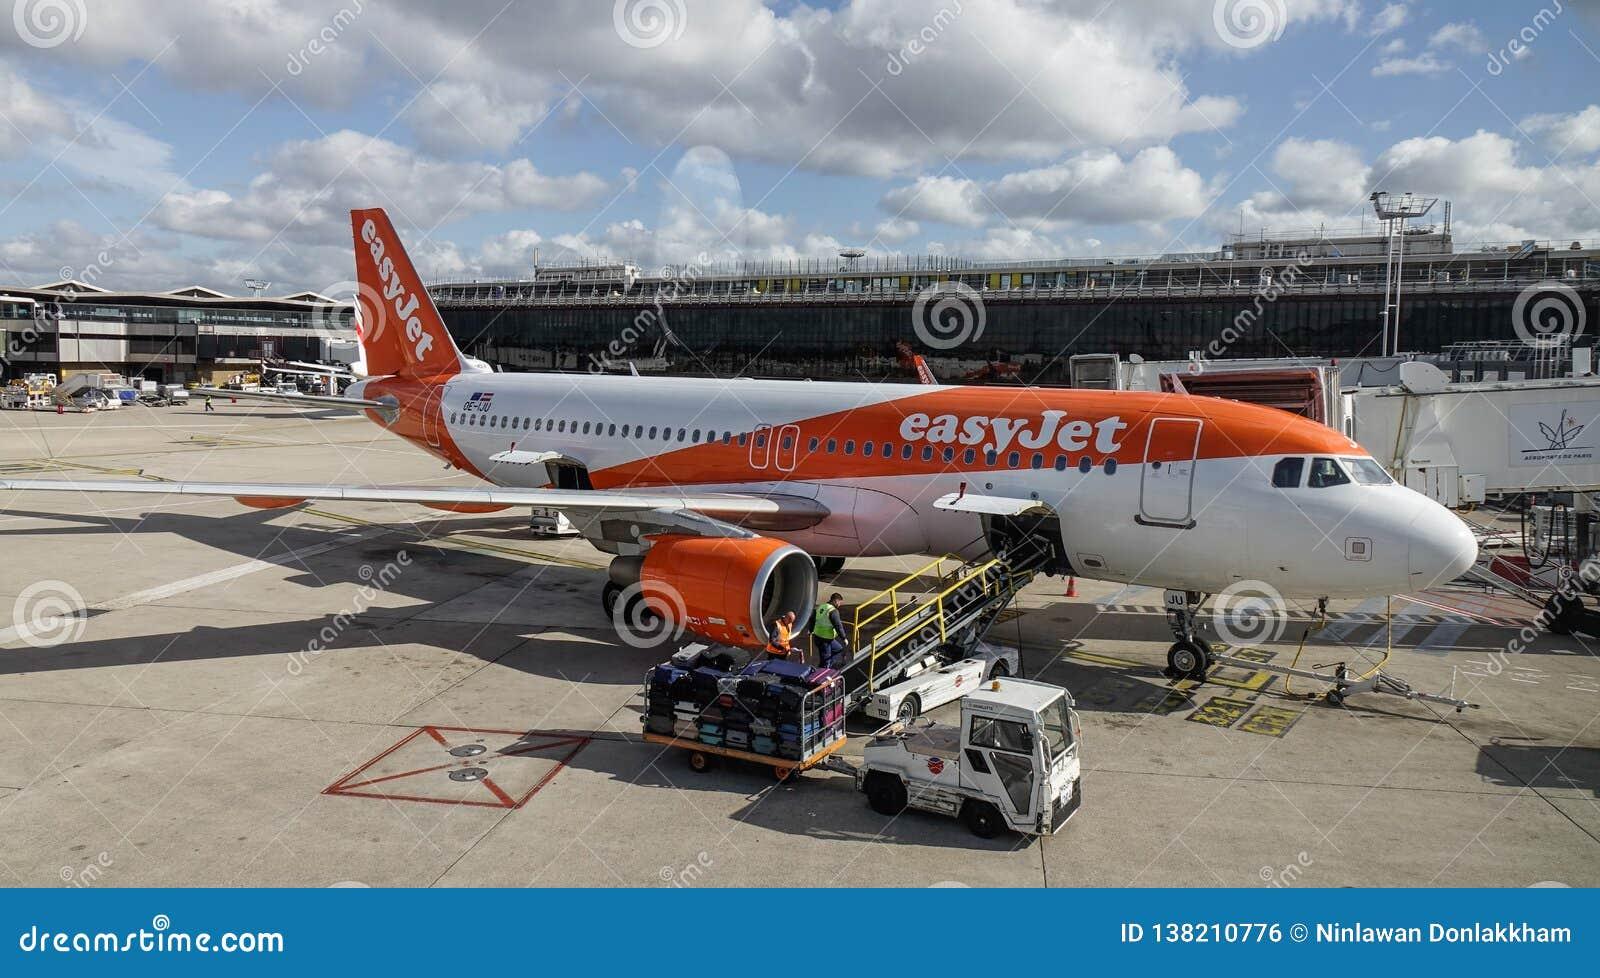 Passenger airplane docking at Paris Orly Airport